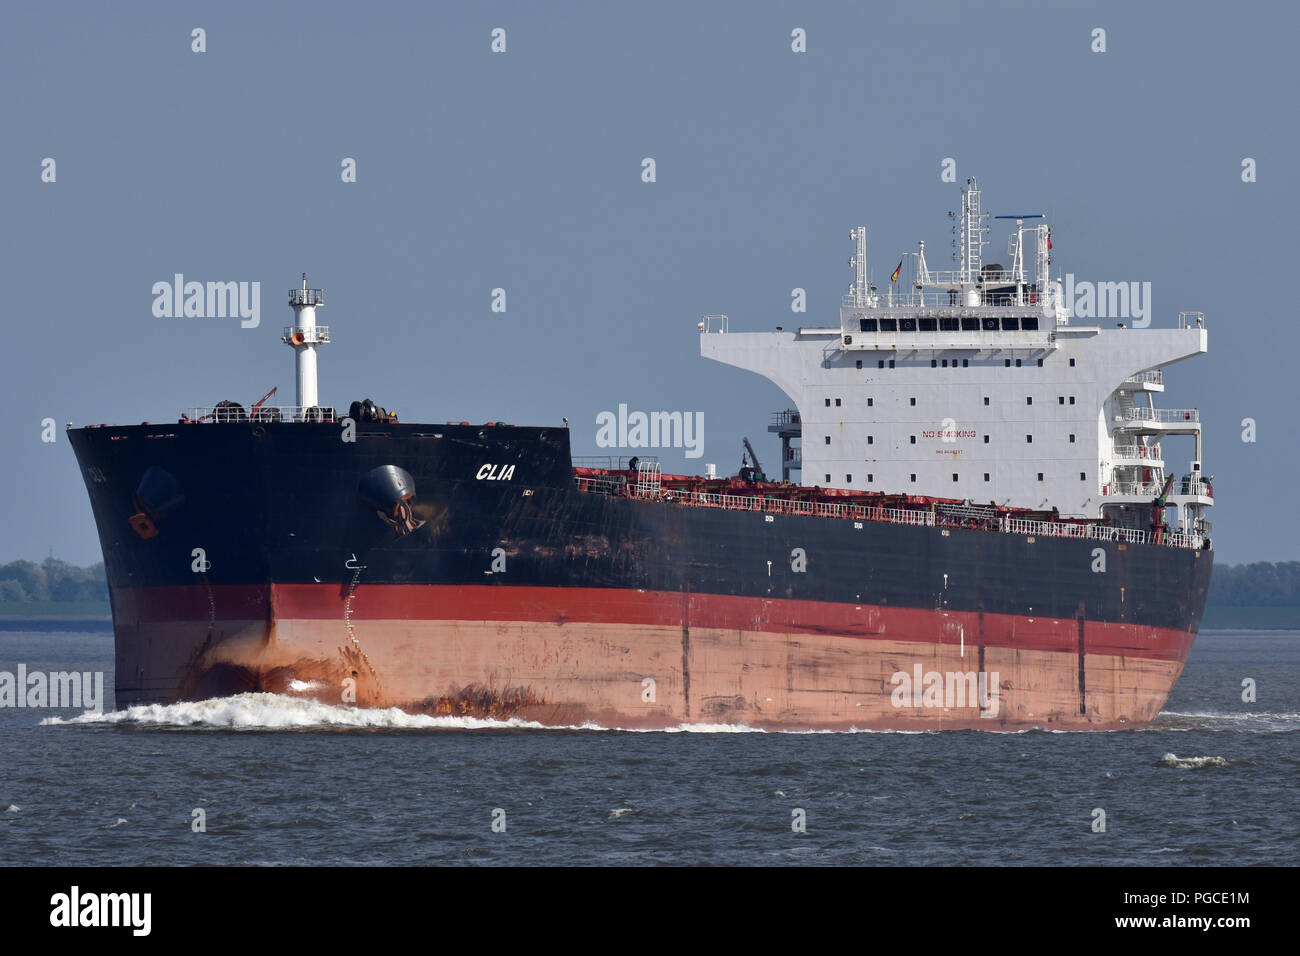 Bulk-Carrier Clia - Stock Image